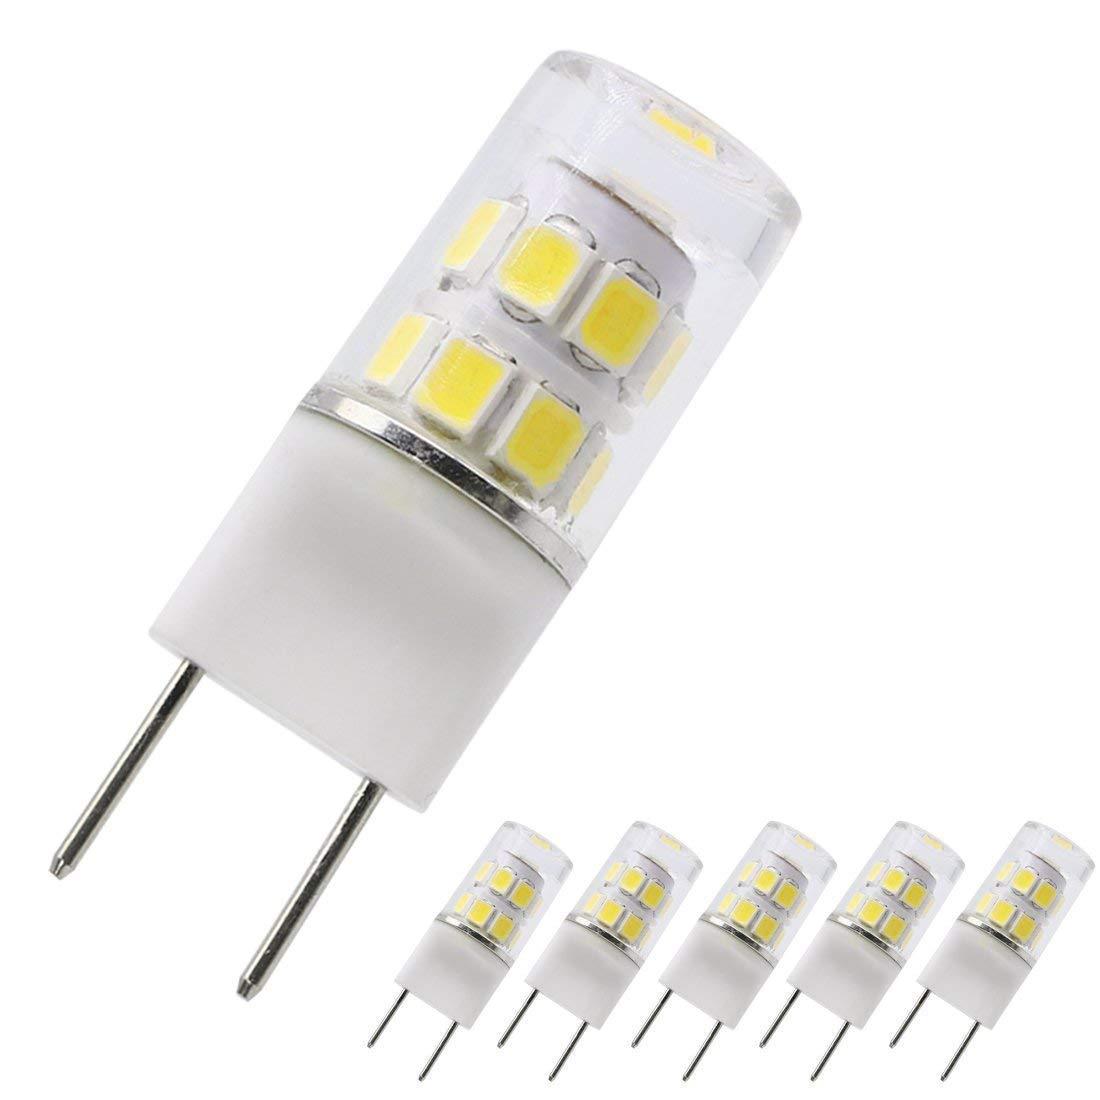 T4 G8 LED Bulb 4000k Natural Daylight 120v 20w 35w LED G8 Replacement 2.5w G8 LED COB Light Bulbs Pin Base LED Halogen Xenon Replacement Light Bulb Puck Light Bulb Under-Counter Lights Microwave Safe